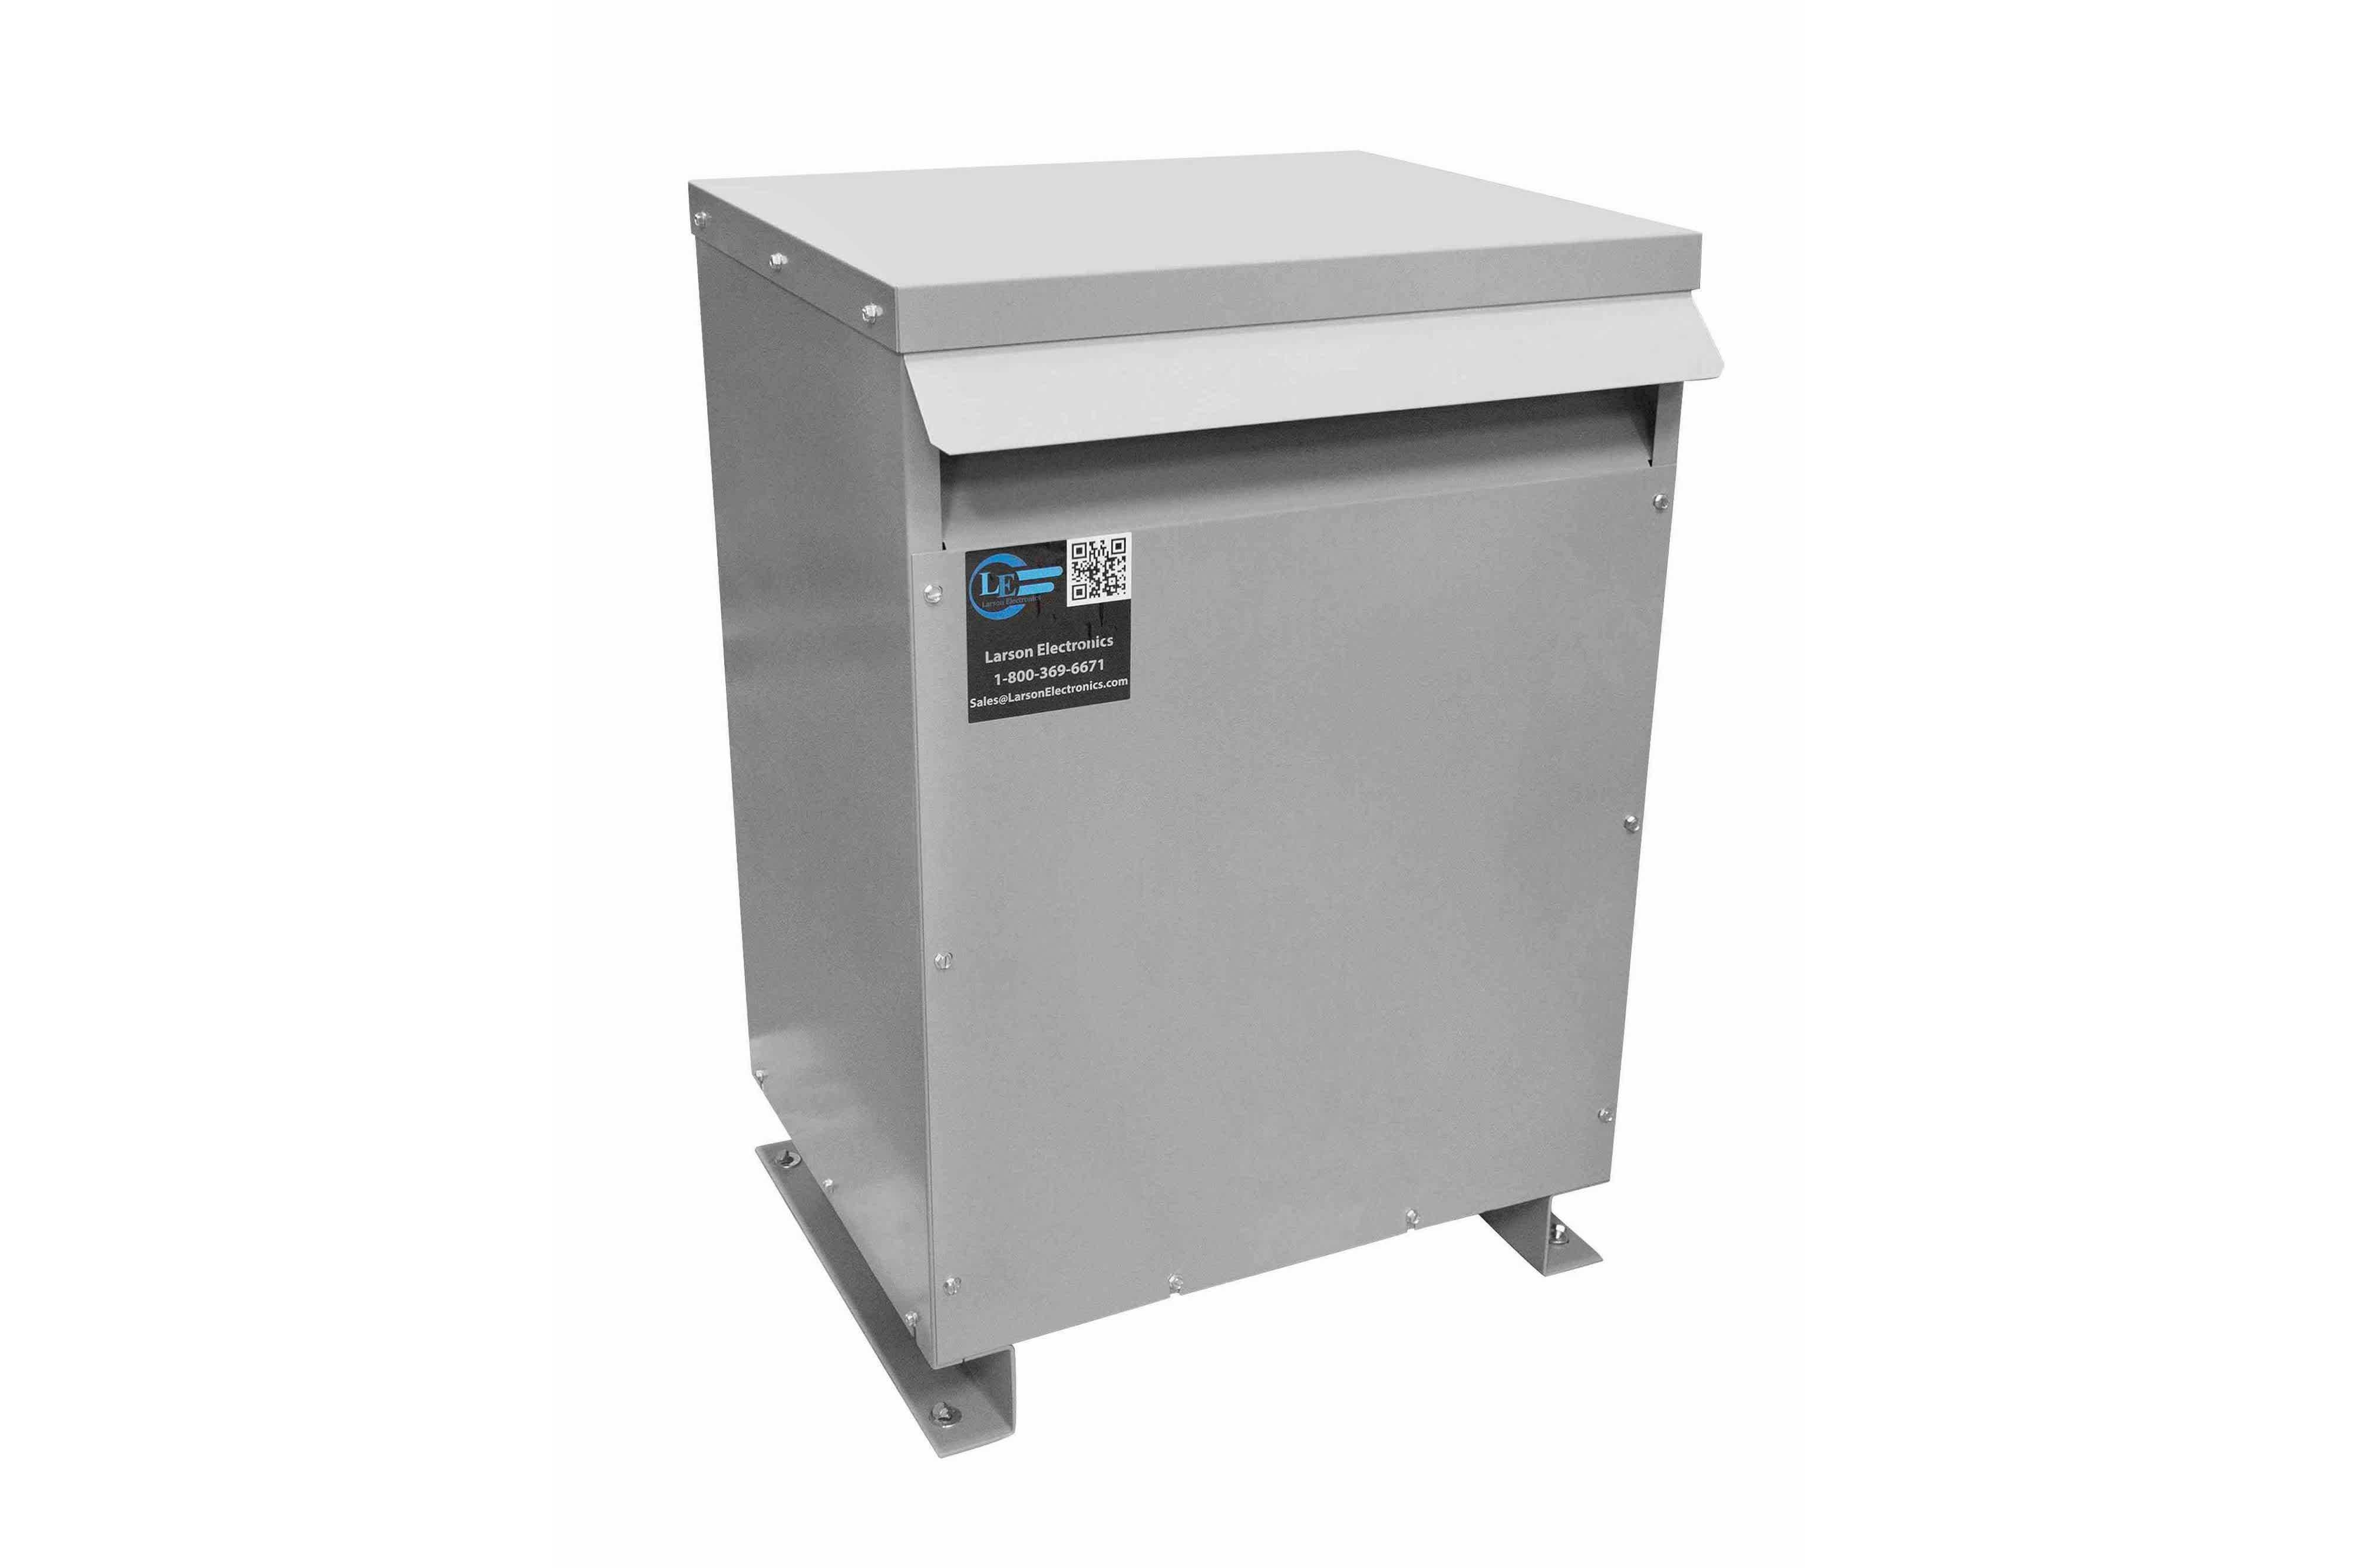 42.5 kVA 3PH Isolation Transformer, 380V Wye Primary, 208Y/120 Wye-N Secondary, N3R, Ventilated, 60 Hz